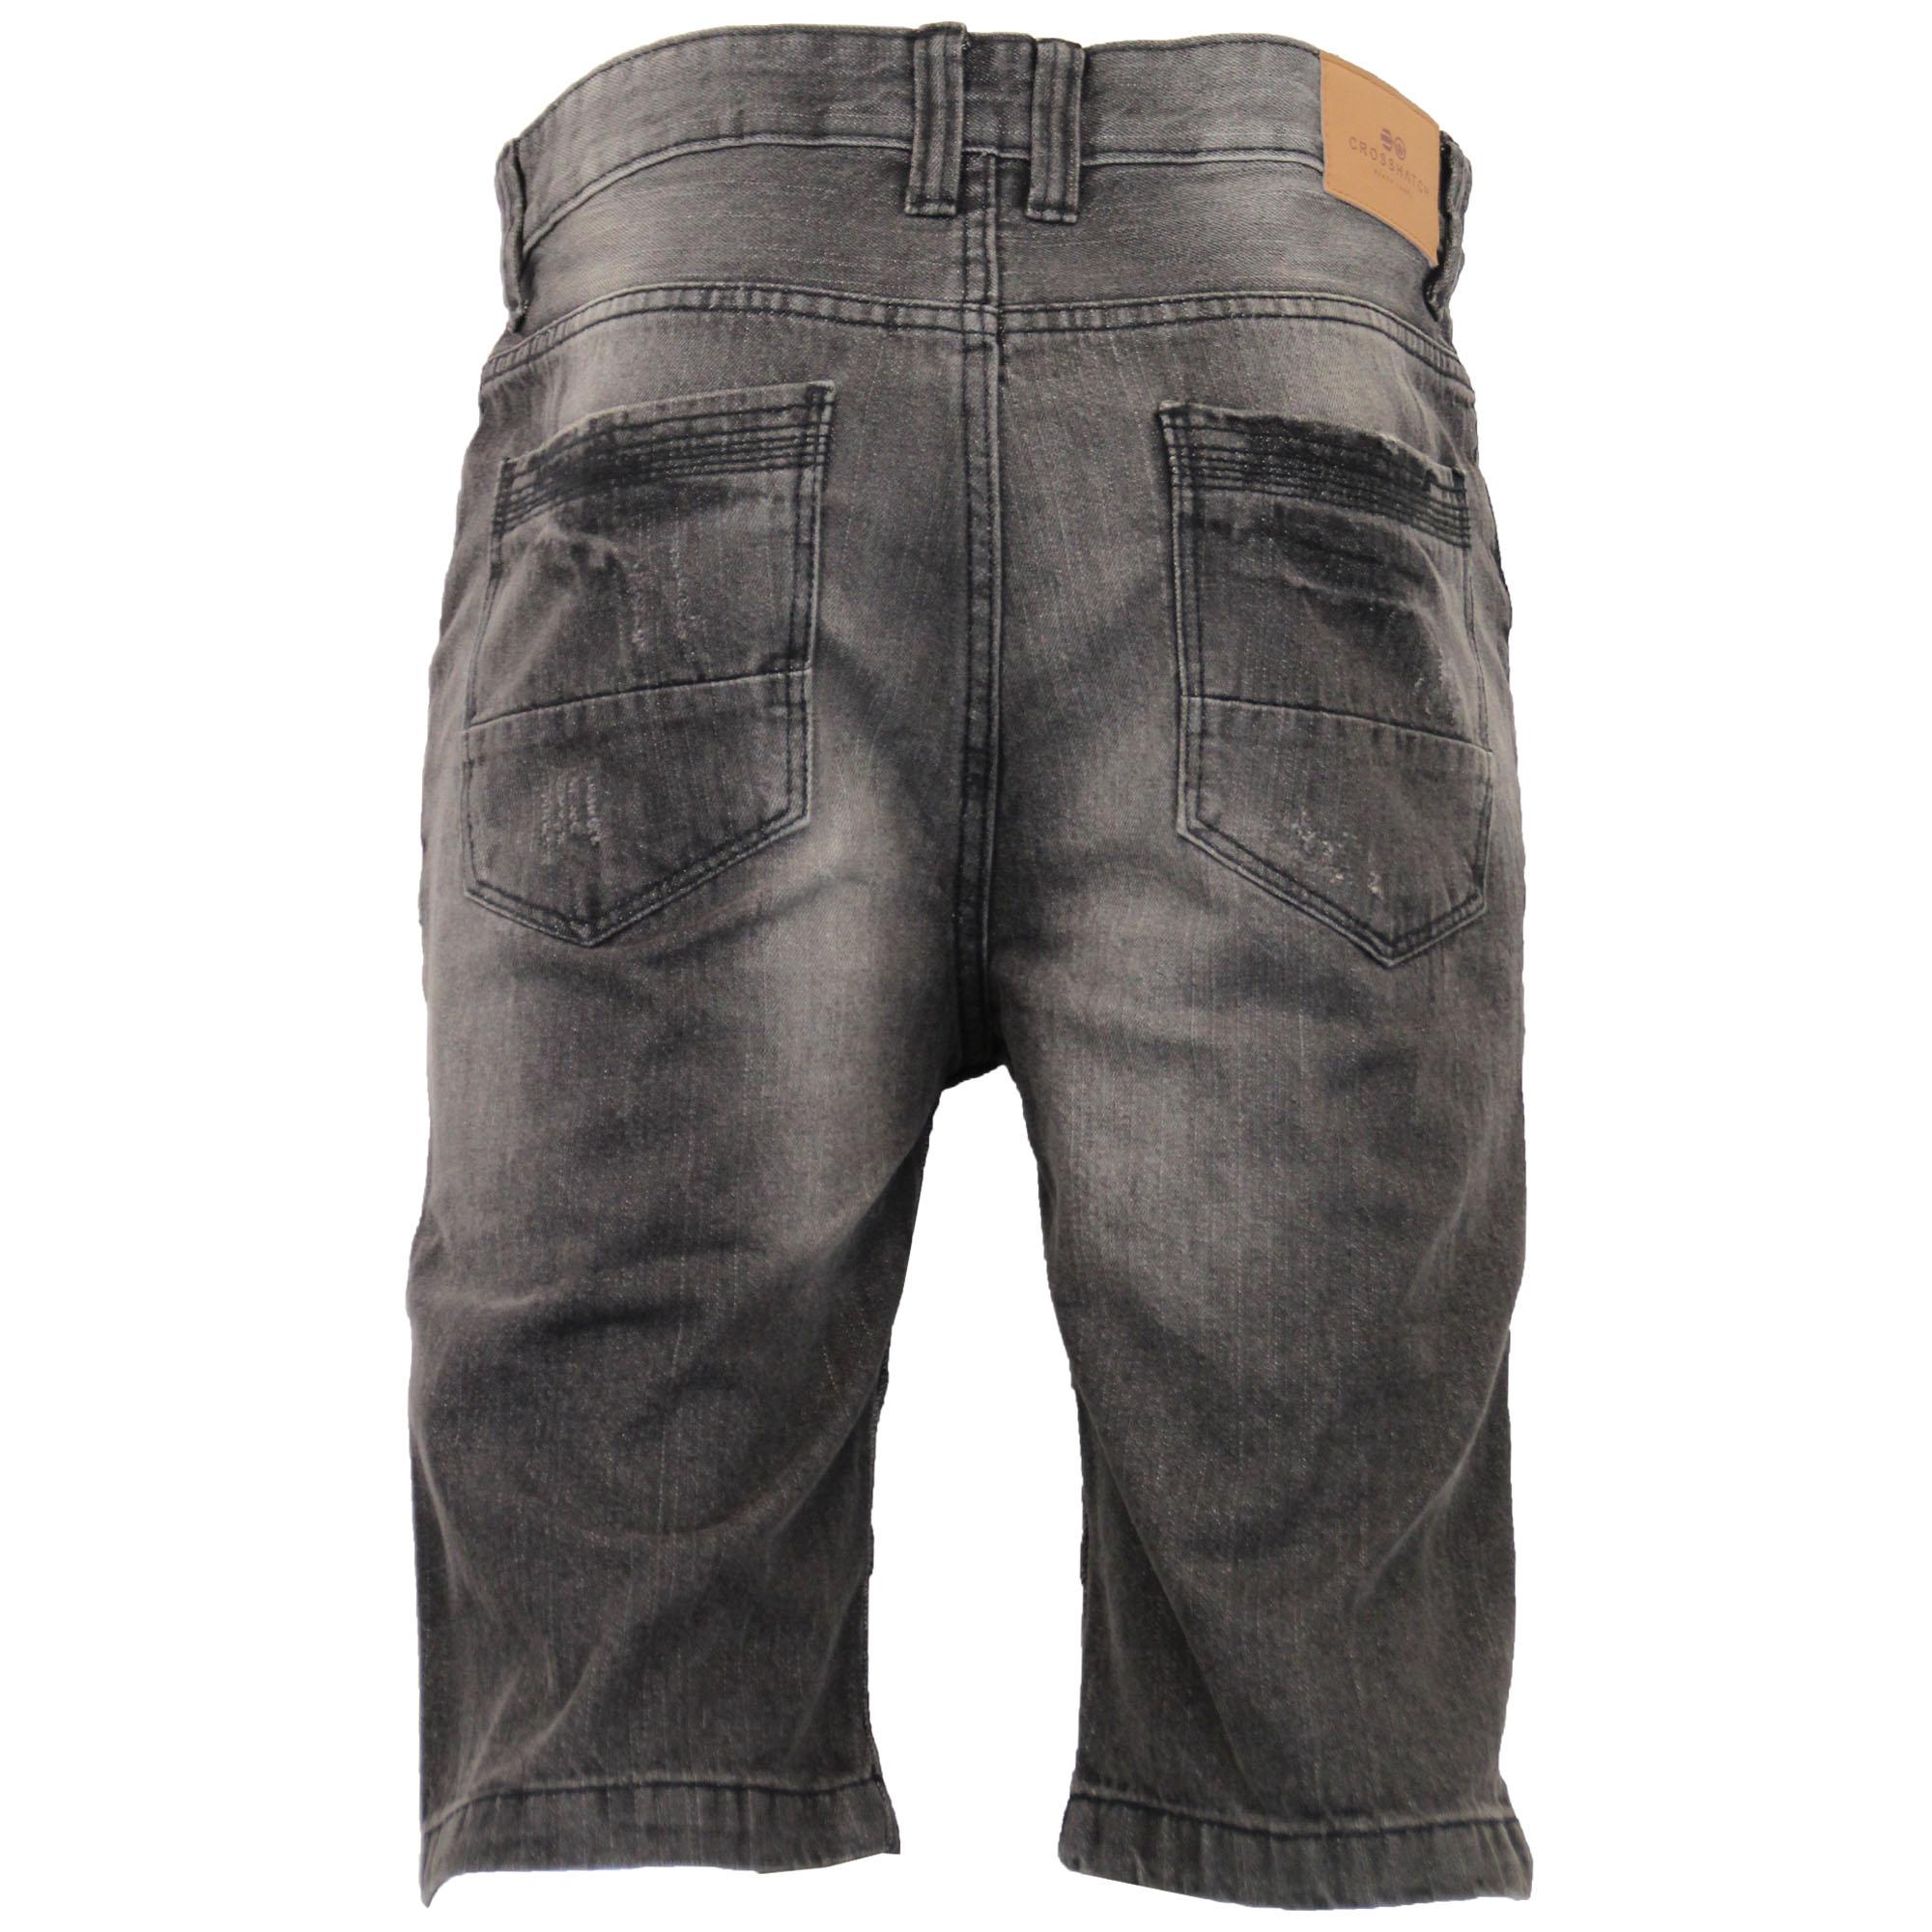 Mens-Crosshatch-Denim-Knee-Length-Combat-Shorts-Cargo-Casual-Fashion-Summer-New 縮圖 9